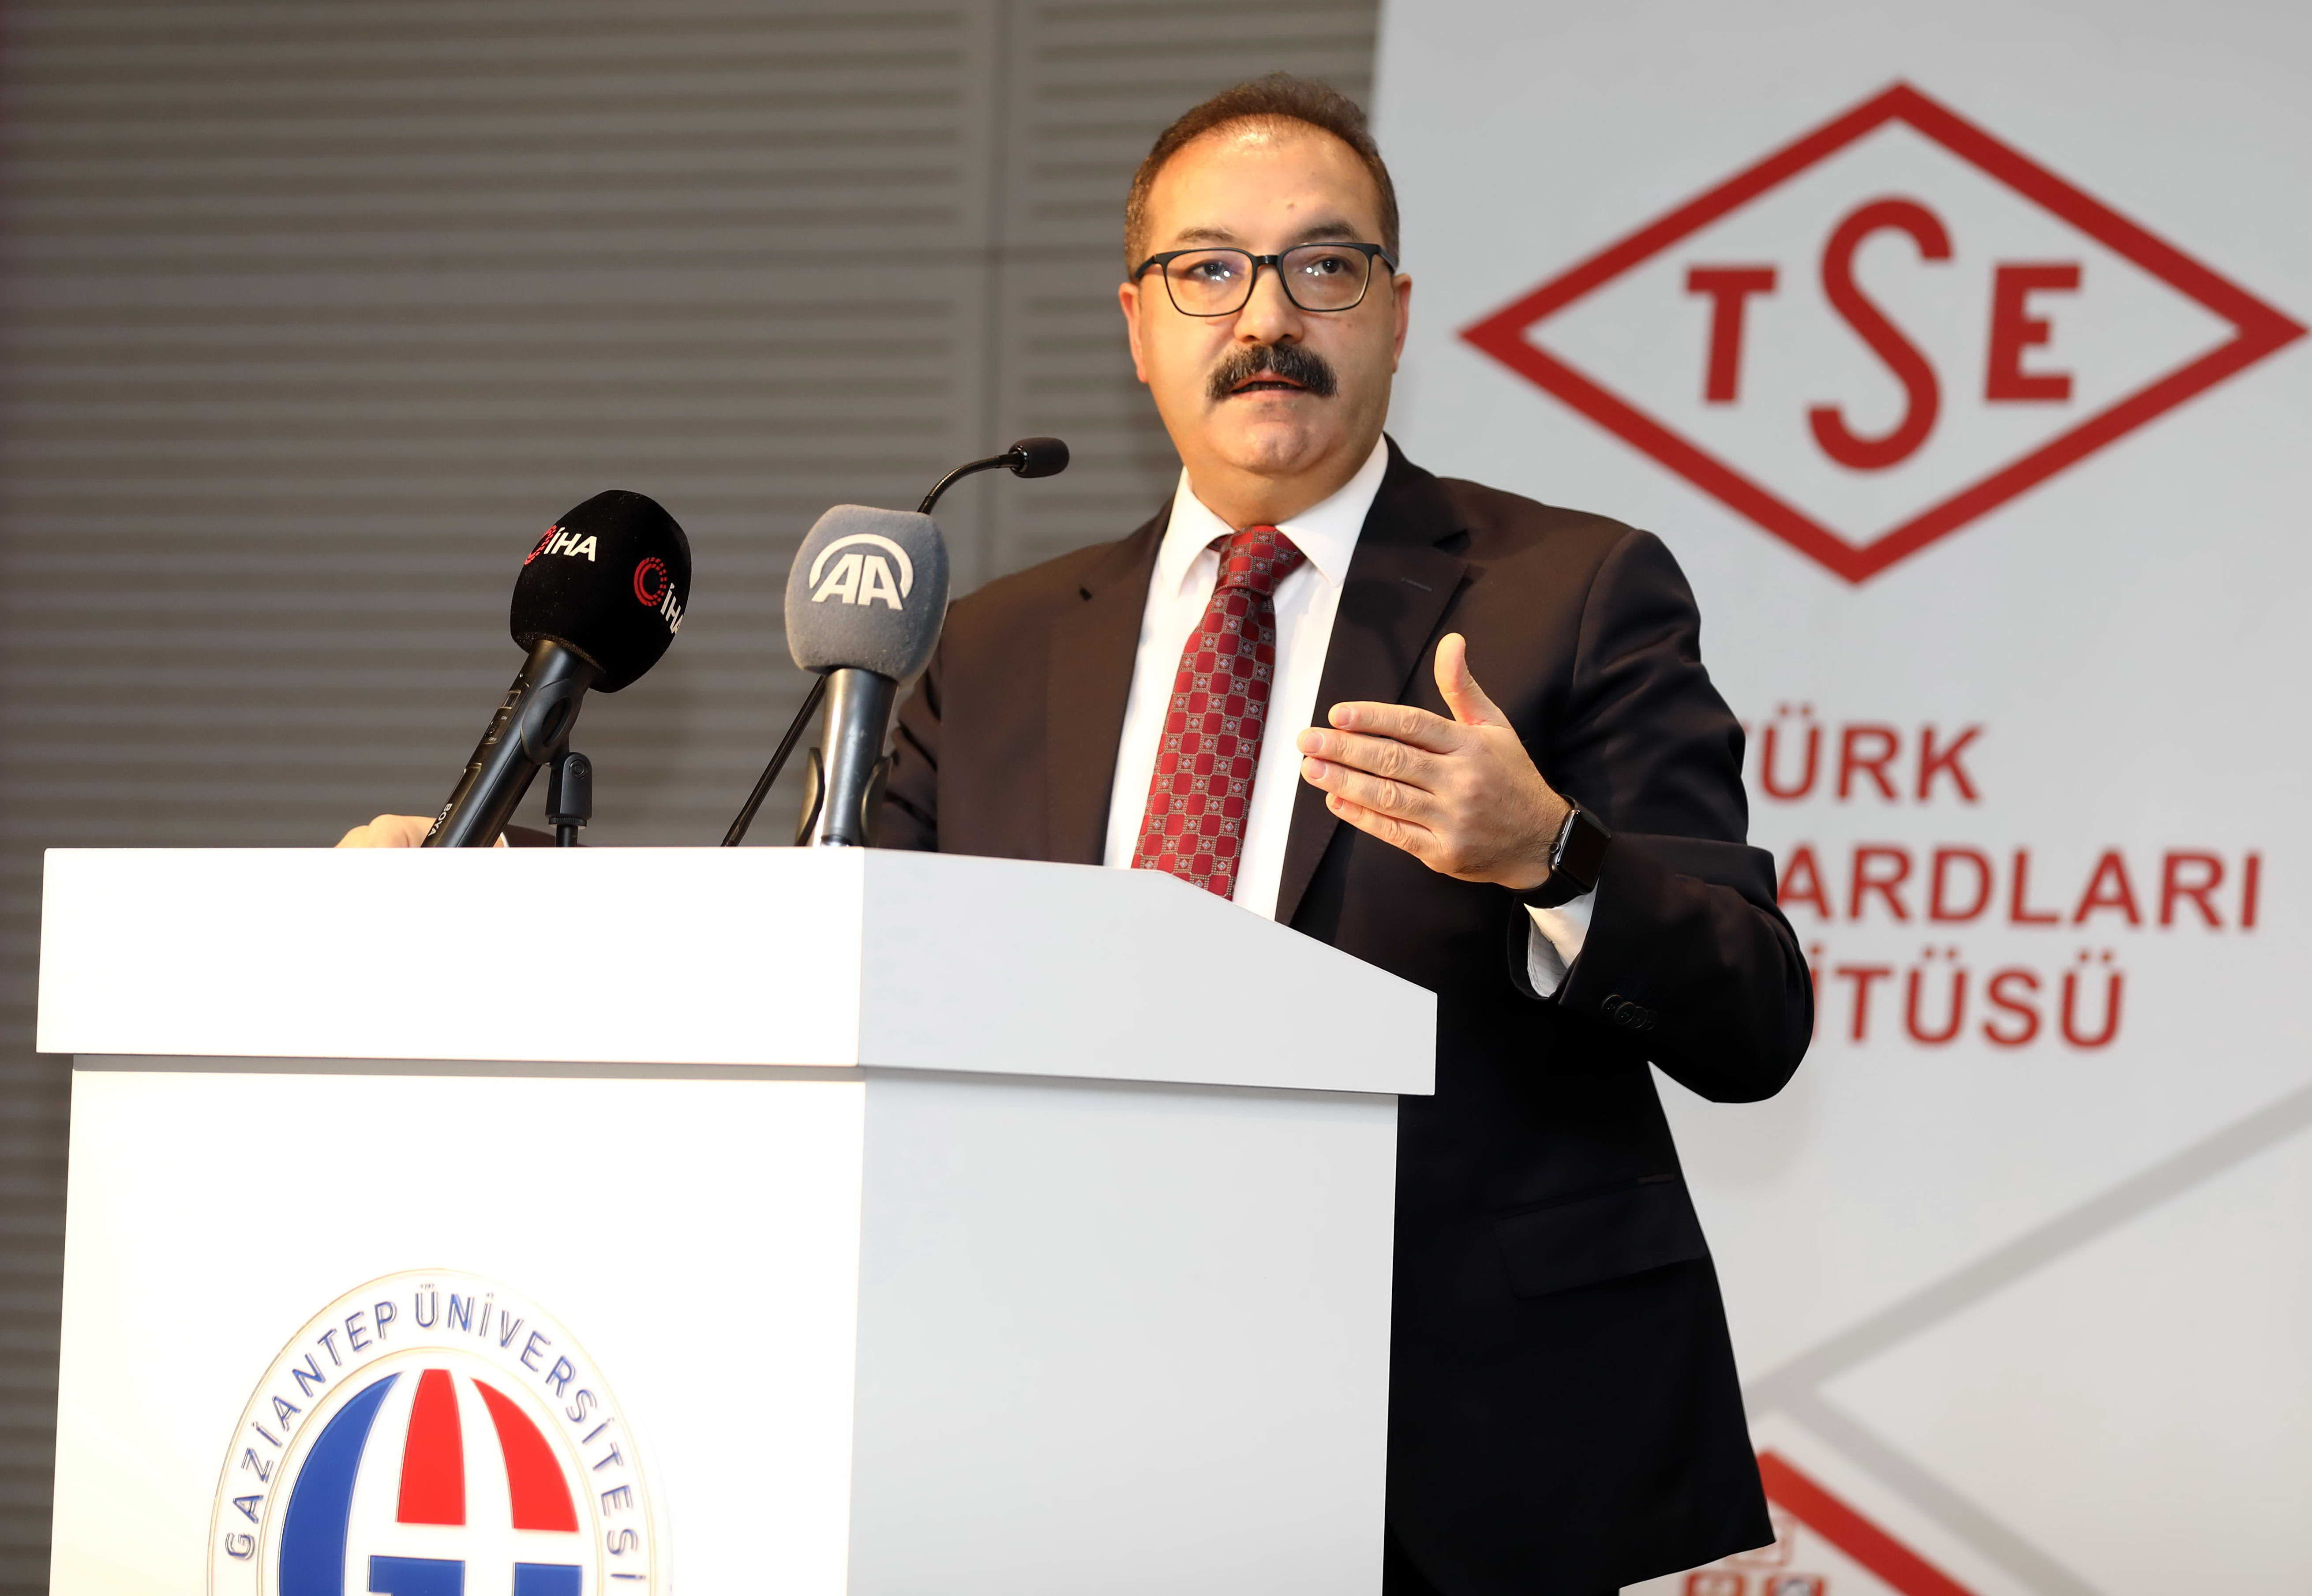 GAÜN KALİTESİNE TSE TESCİLİ - Prof. Dr. Ali Gür-1